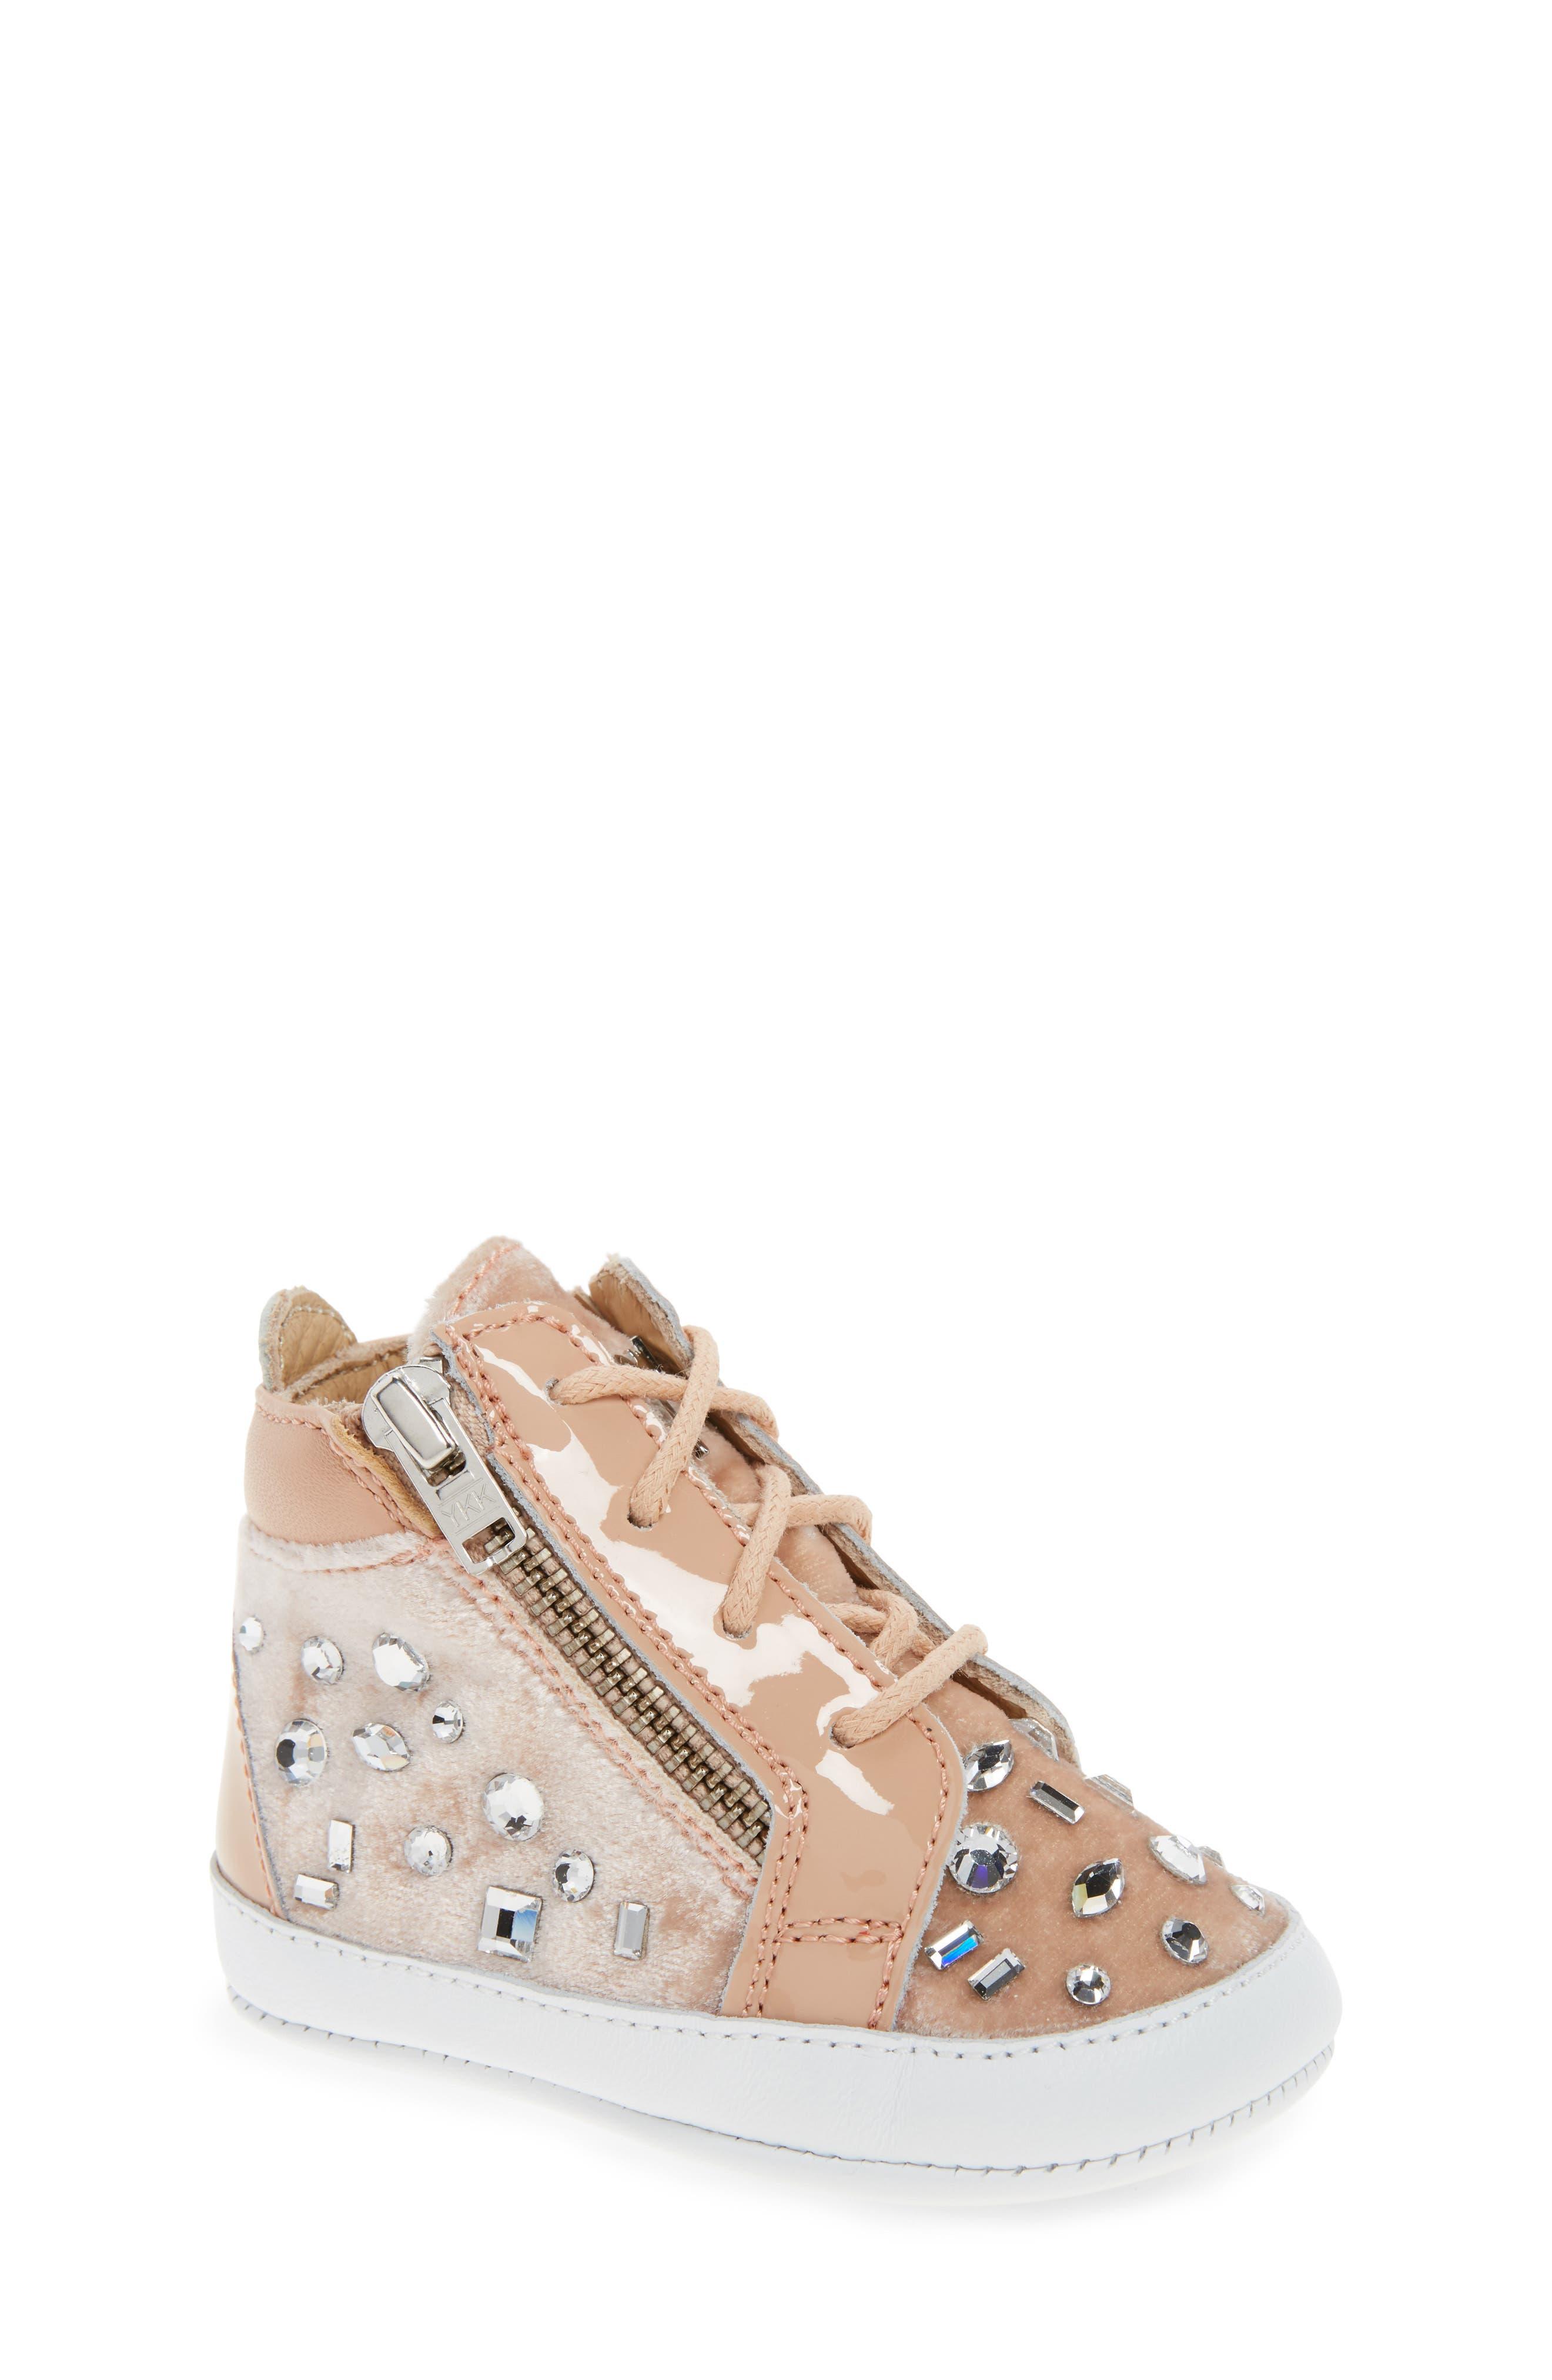 Veronica Embellished Sneaker,                         Main,                         color, CIPRIA